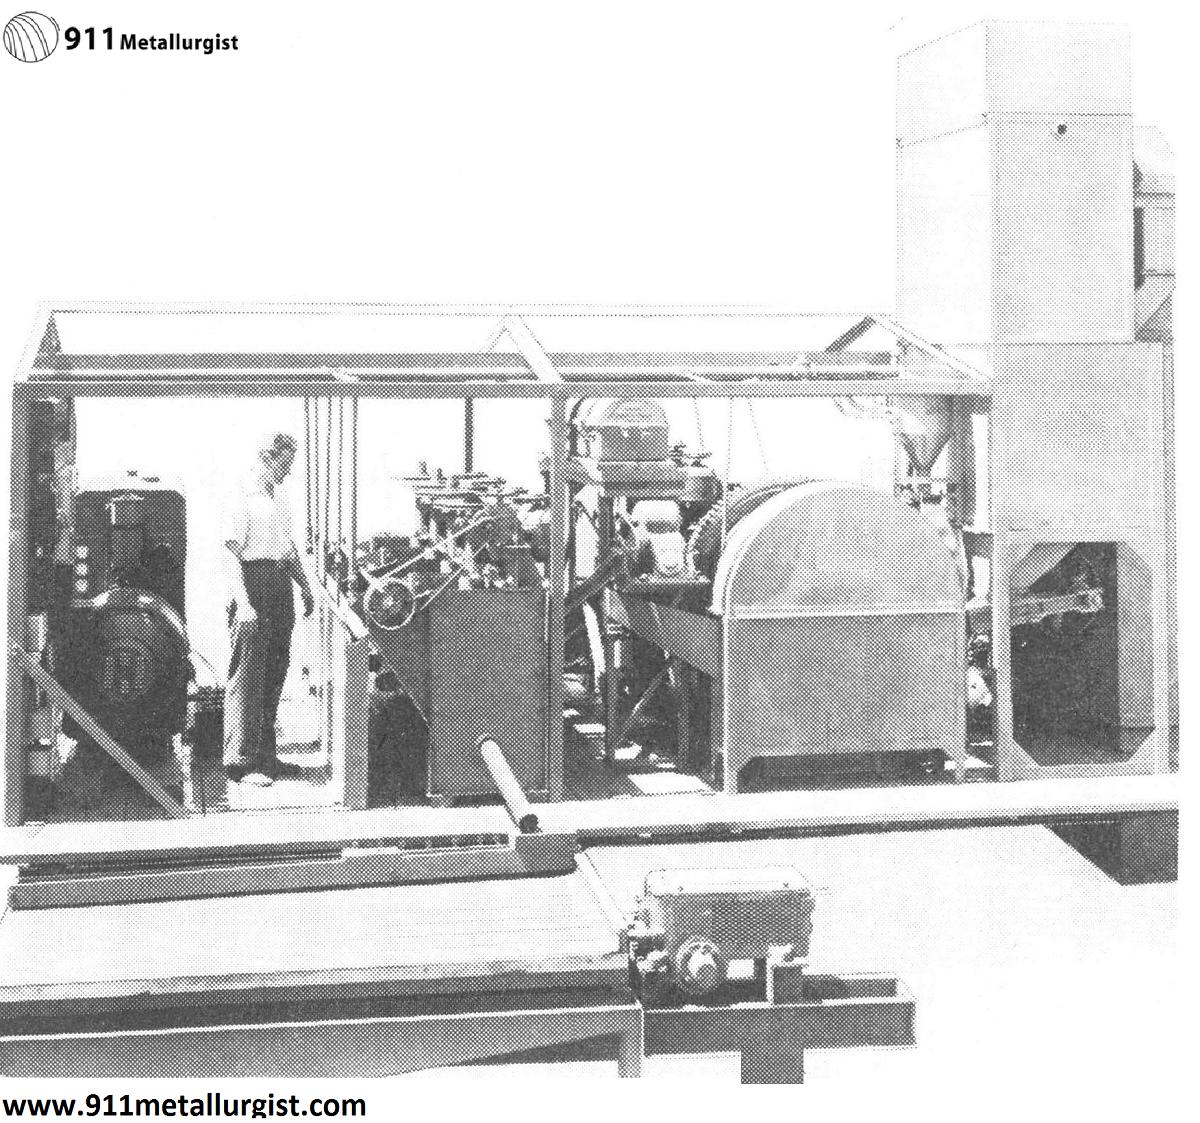 Inspection before Shipment